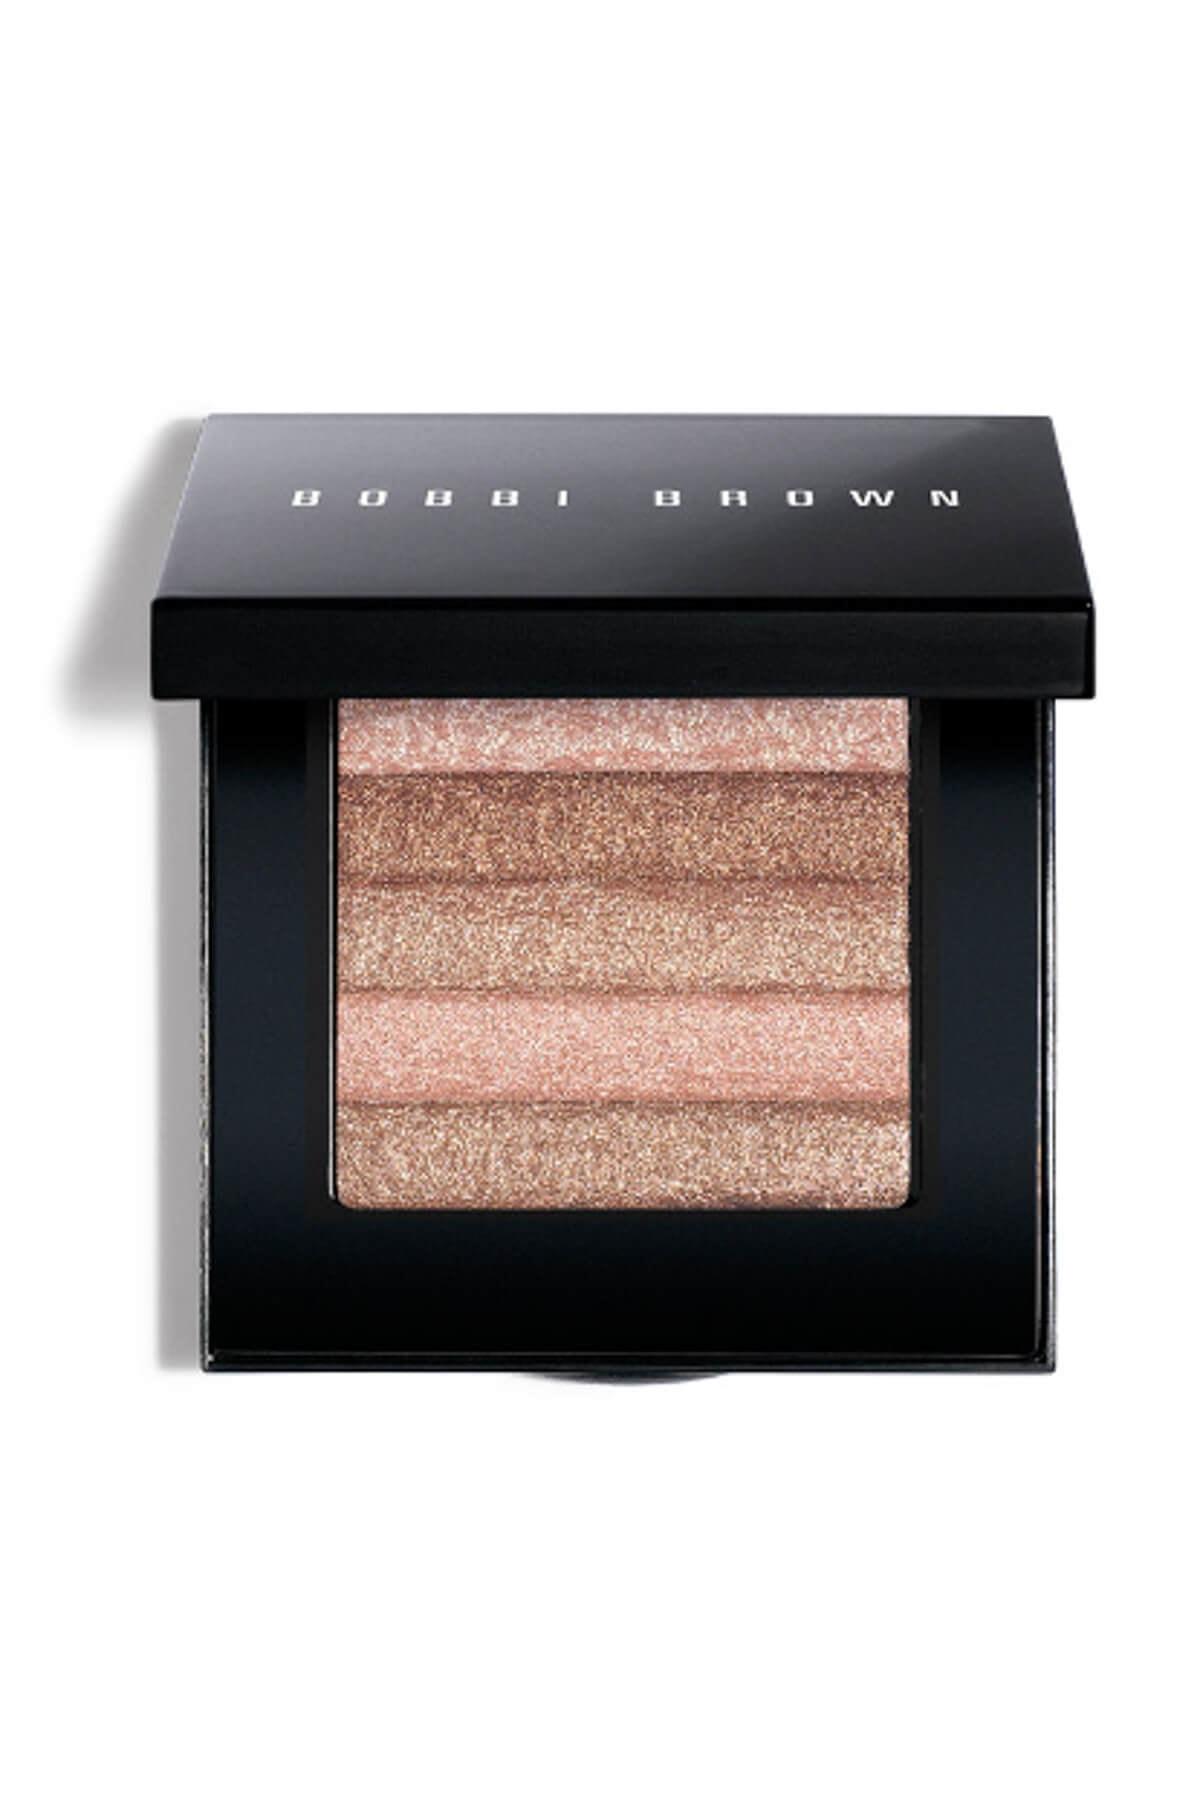 BOBBI BROWN Pudra - Shimmer Brick Compact Pink Quartz 10.3 g 1